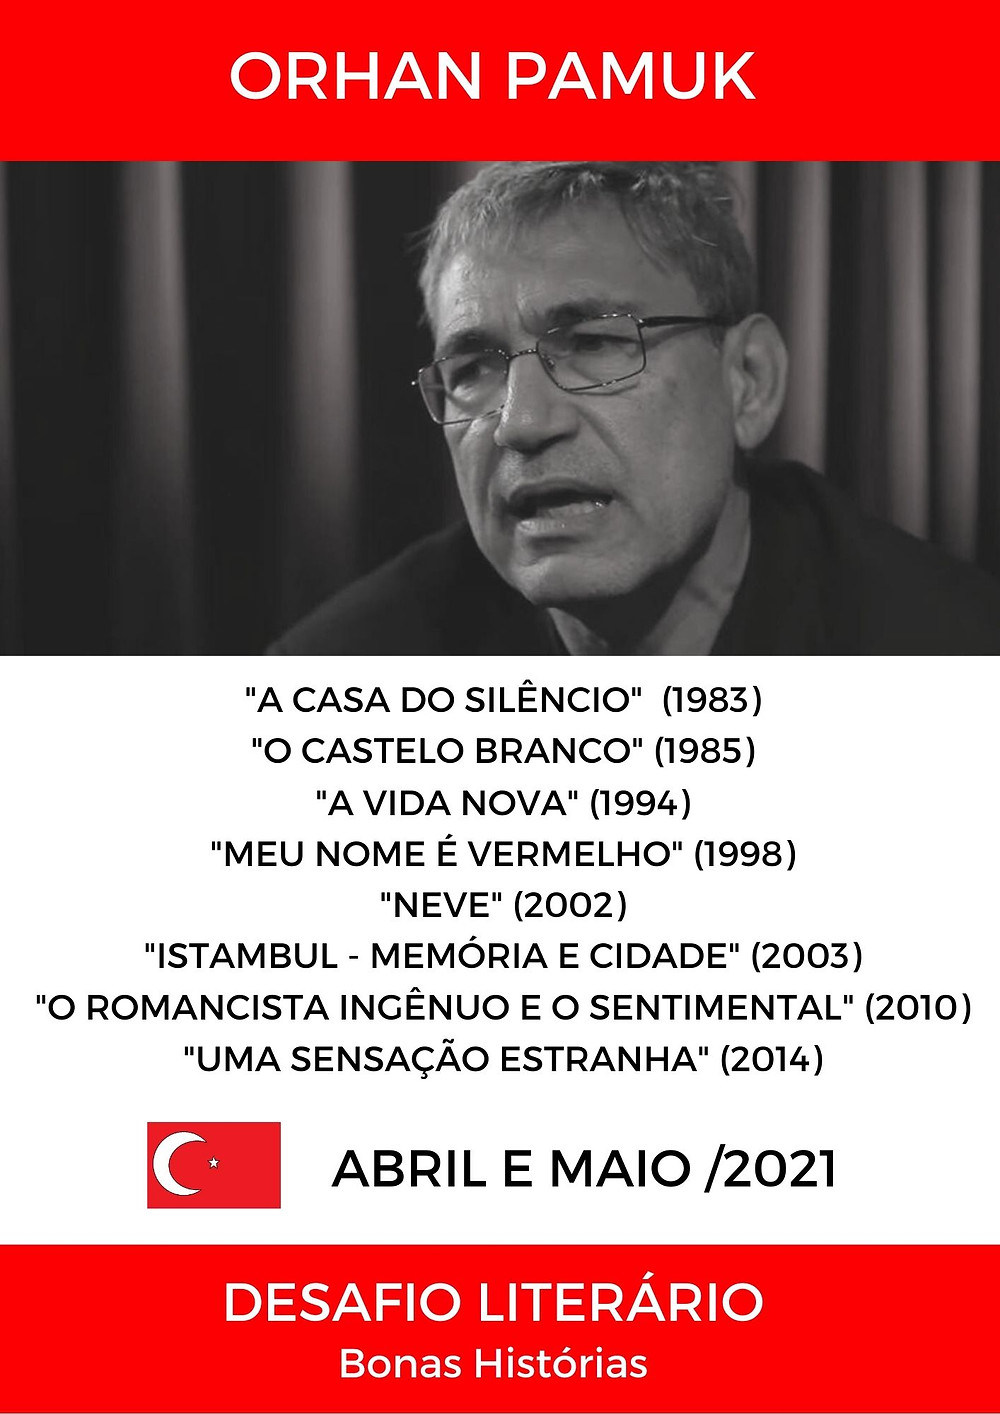 Análise Literária de Orhan Pamuk